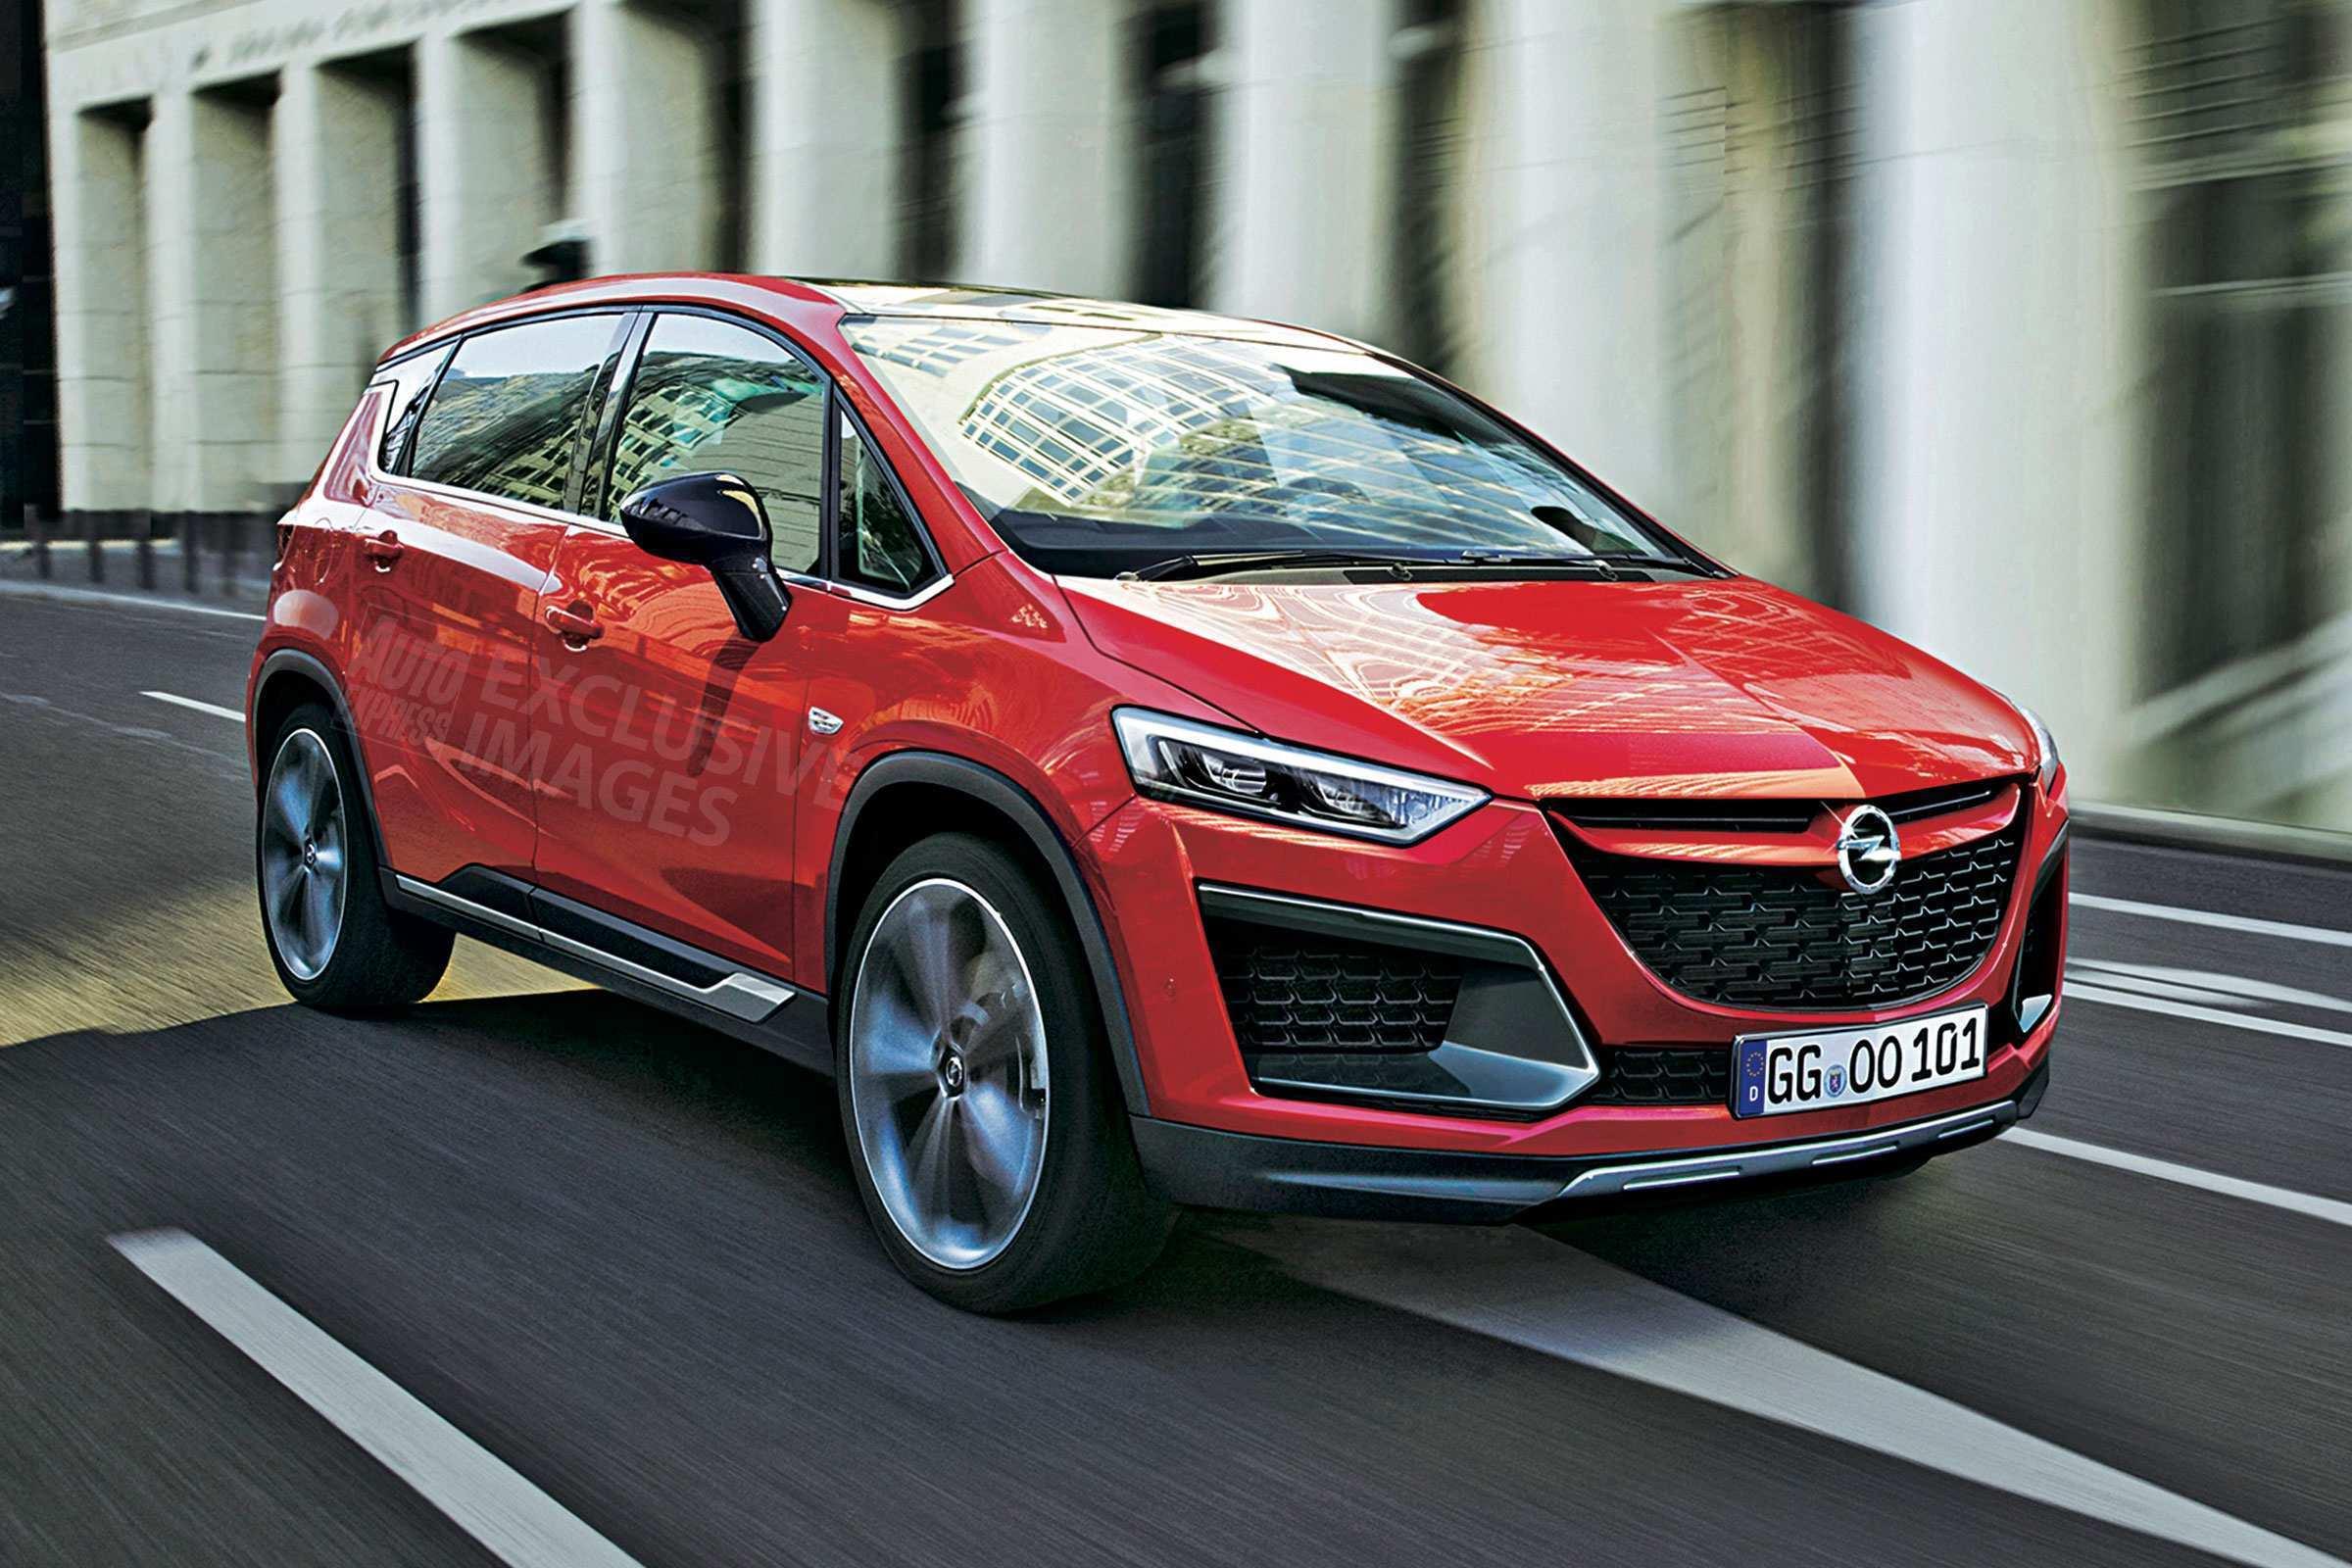 69 All New Opel Zafira 2020 Price for Opel Zafira 2020